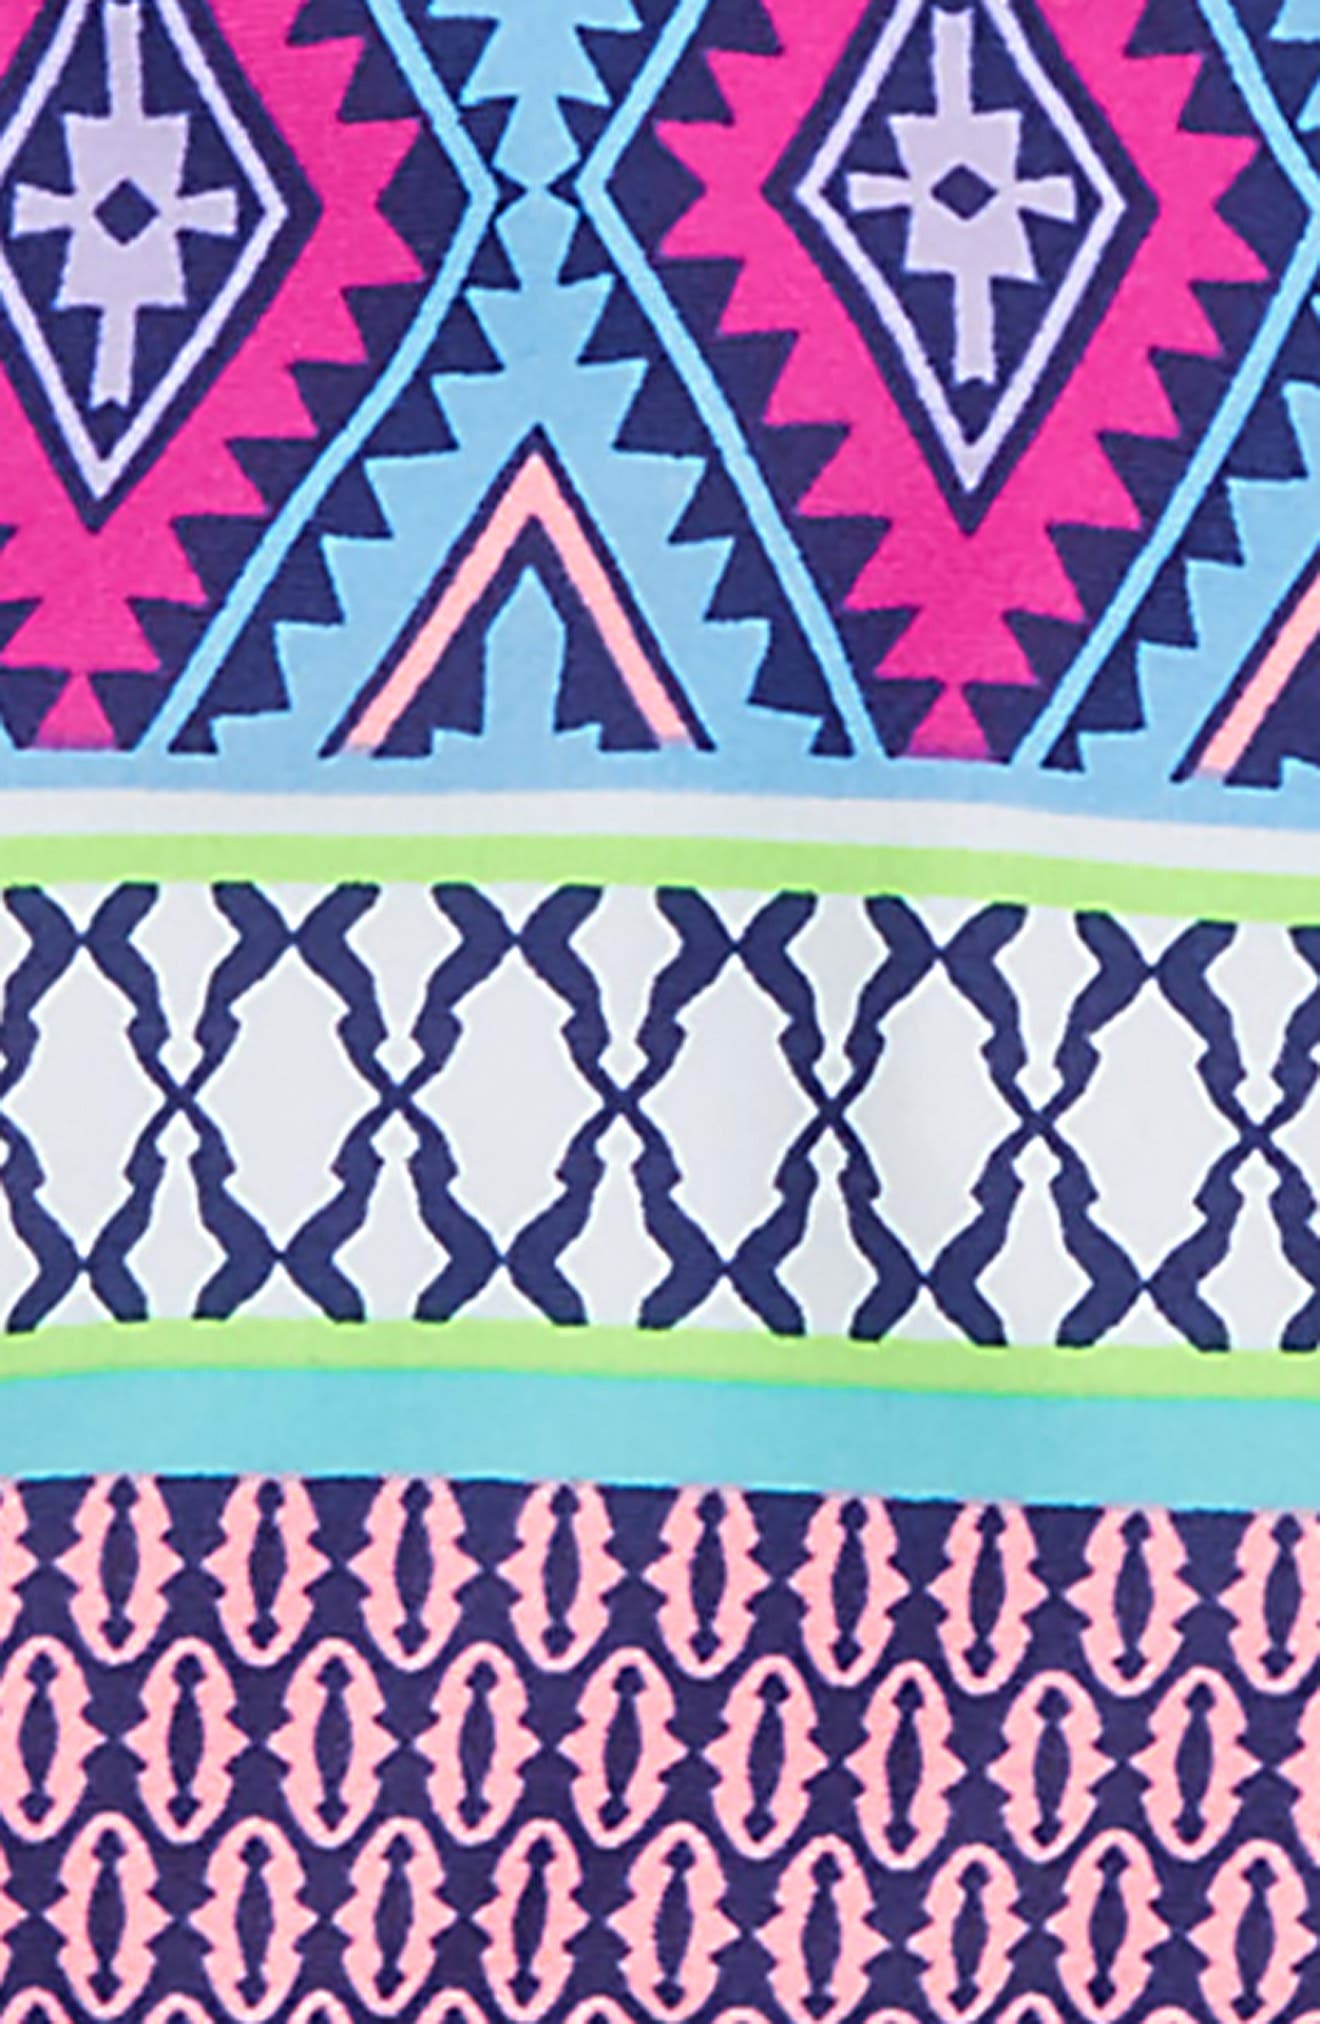 Stripe Fusion Two-Piece Swimsuit,                             Alternate thumbnail 3, color,                             476